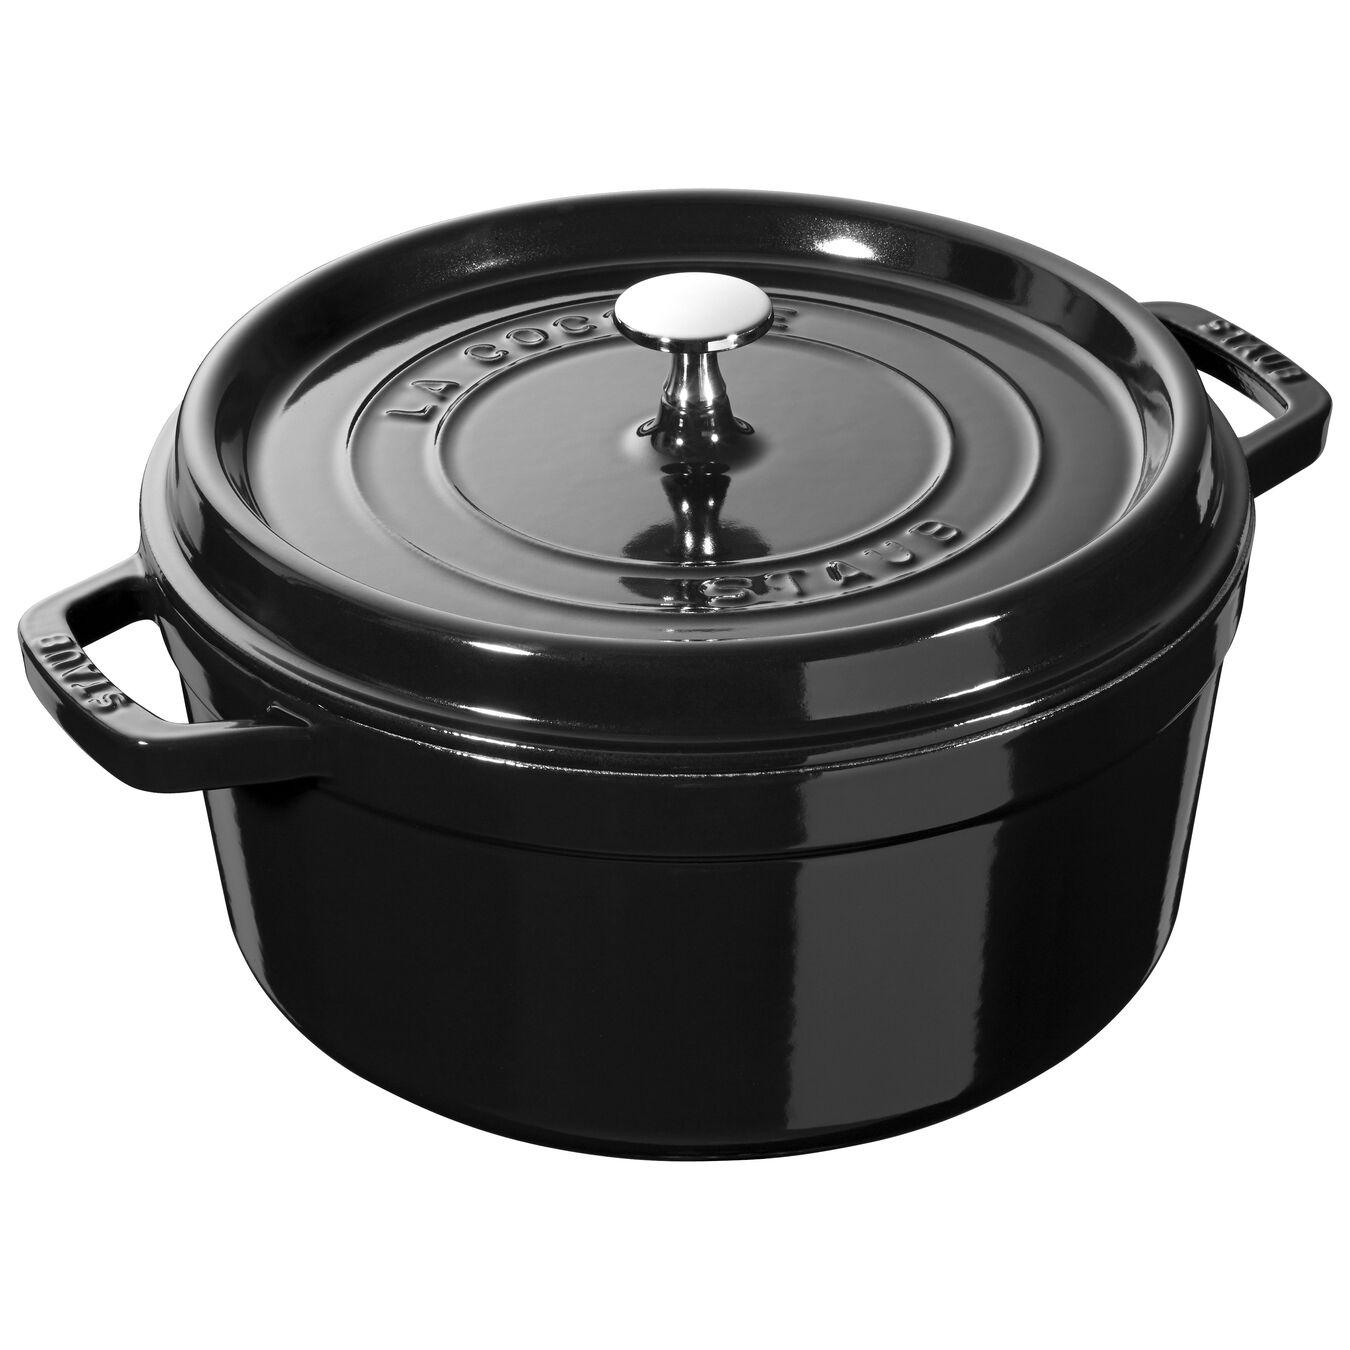 3,75 l Cast iron round Faitout, Shiny-Black,,large 1